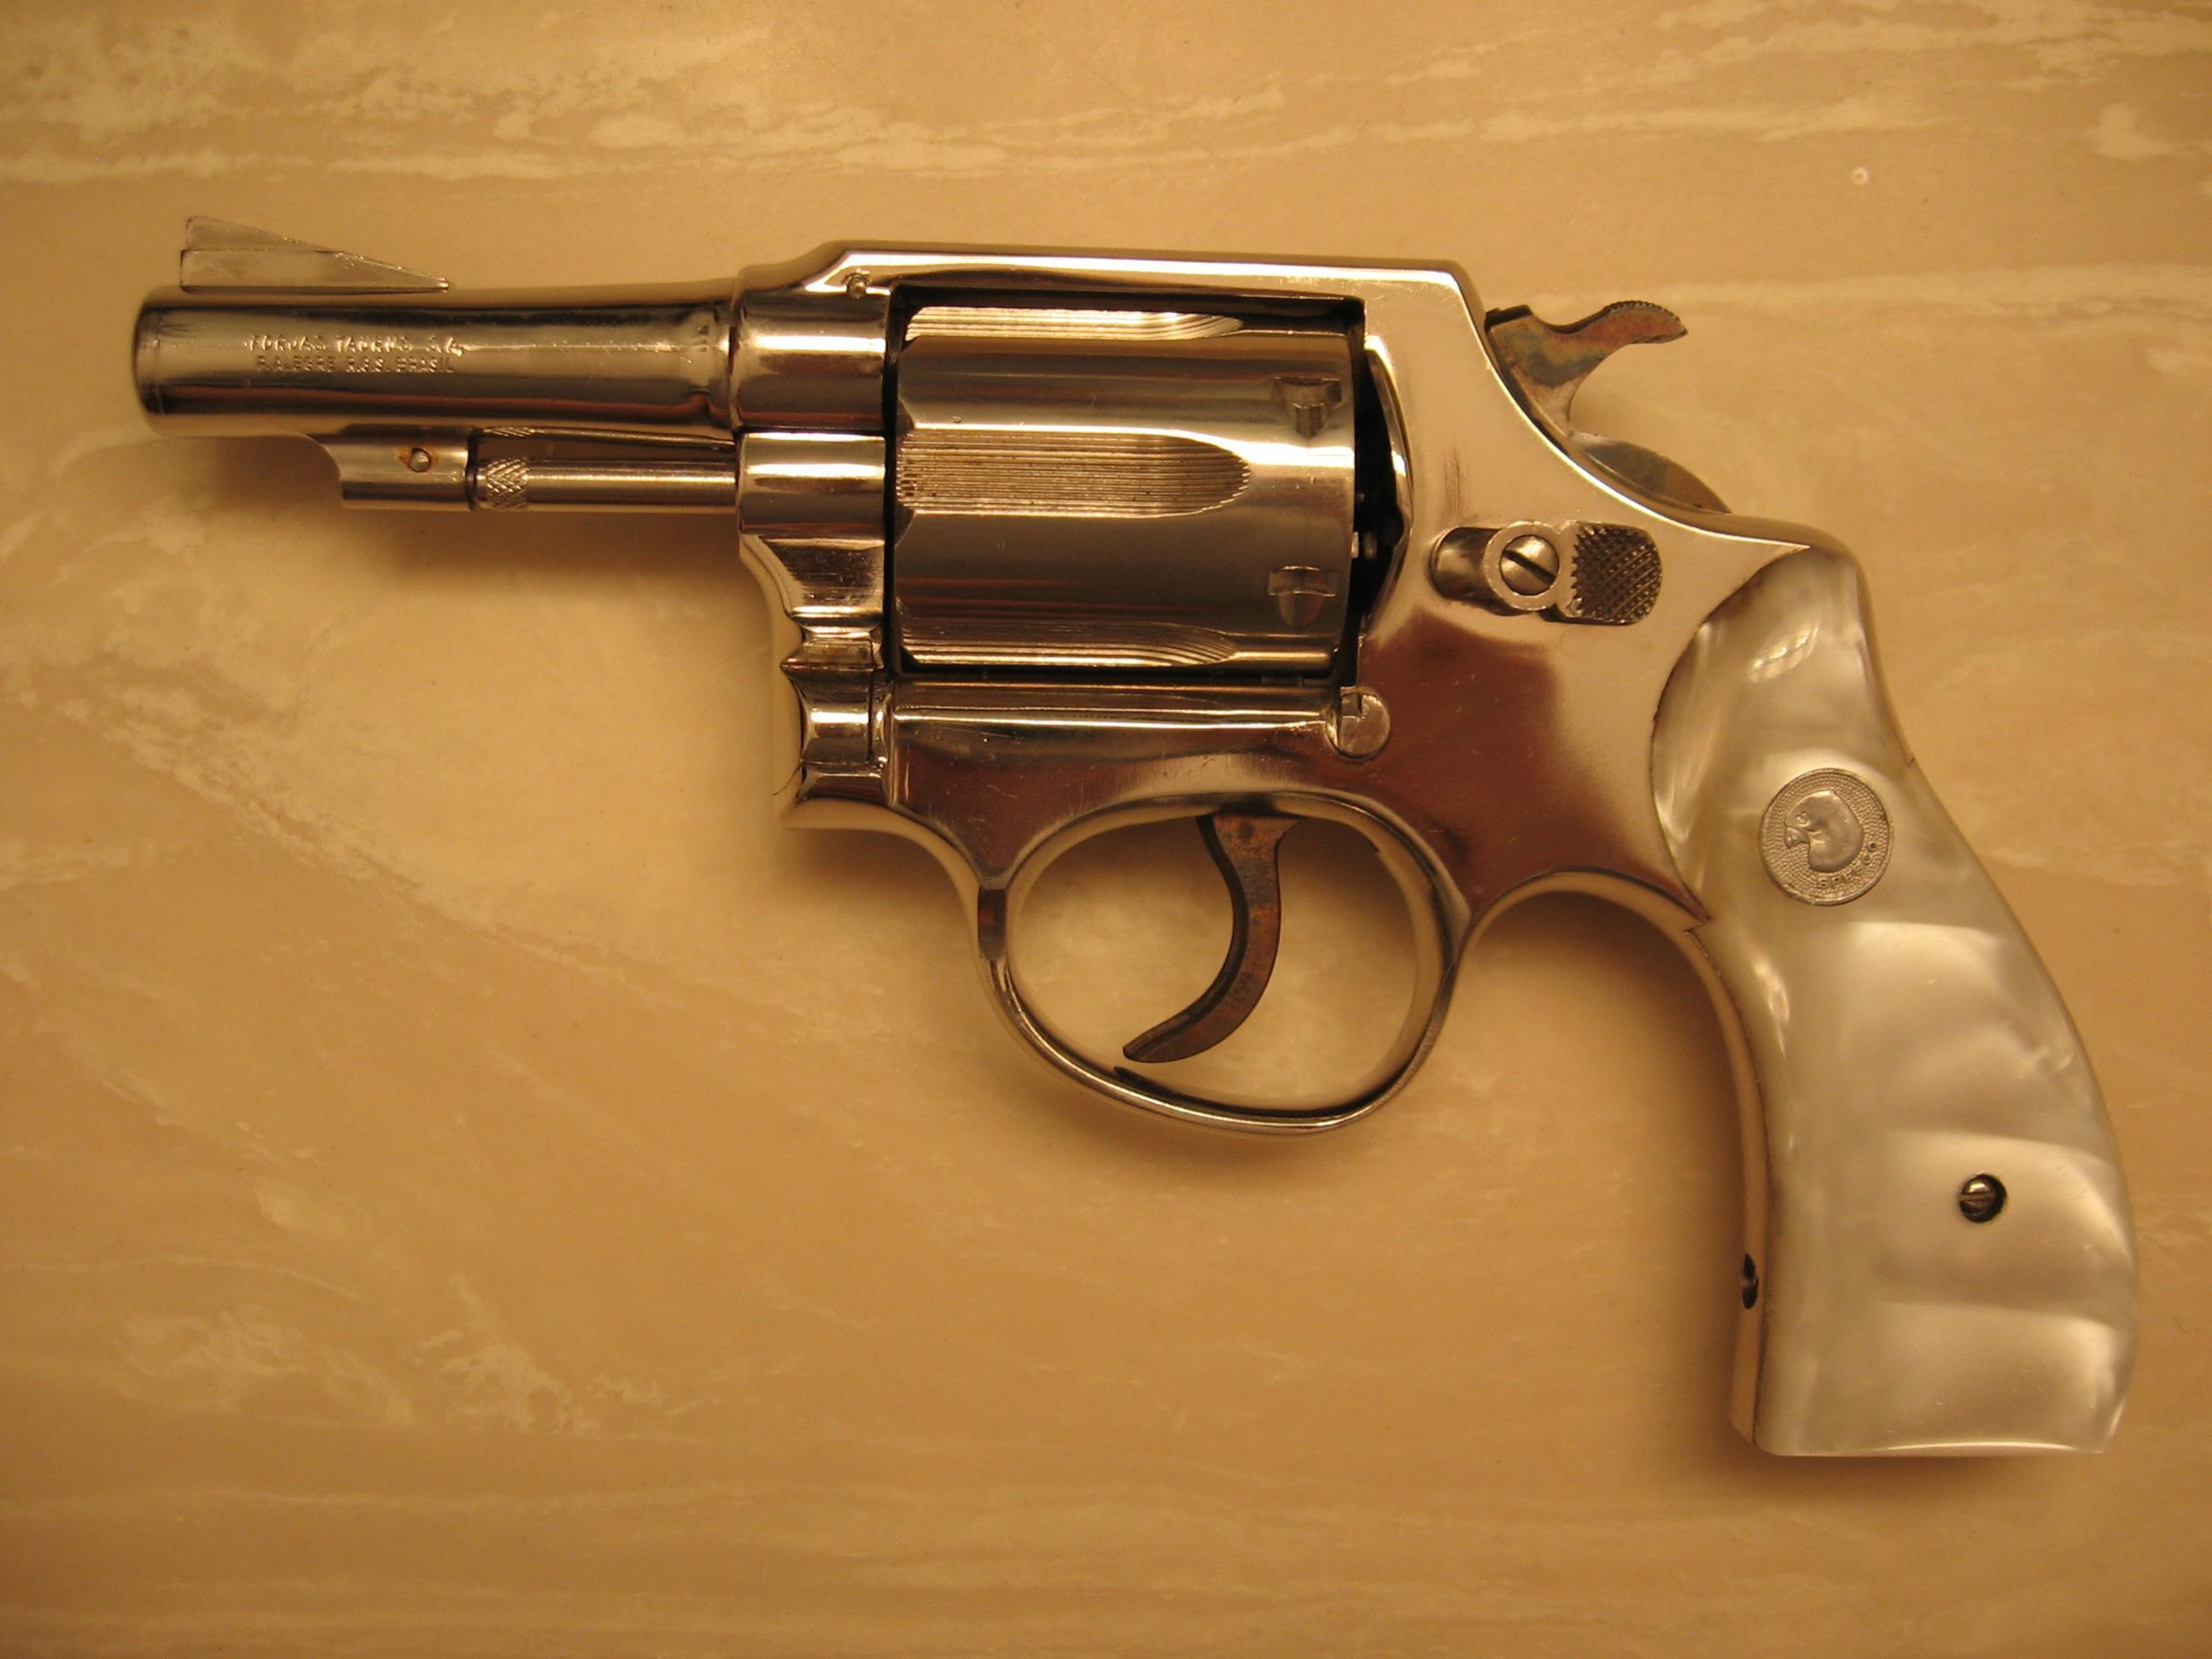 Please help identify these revolvers!-img_0642.jpg